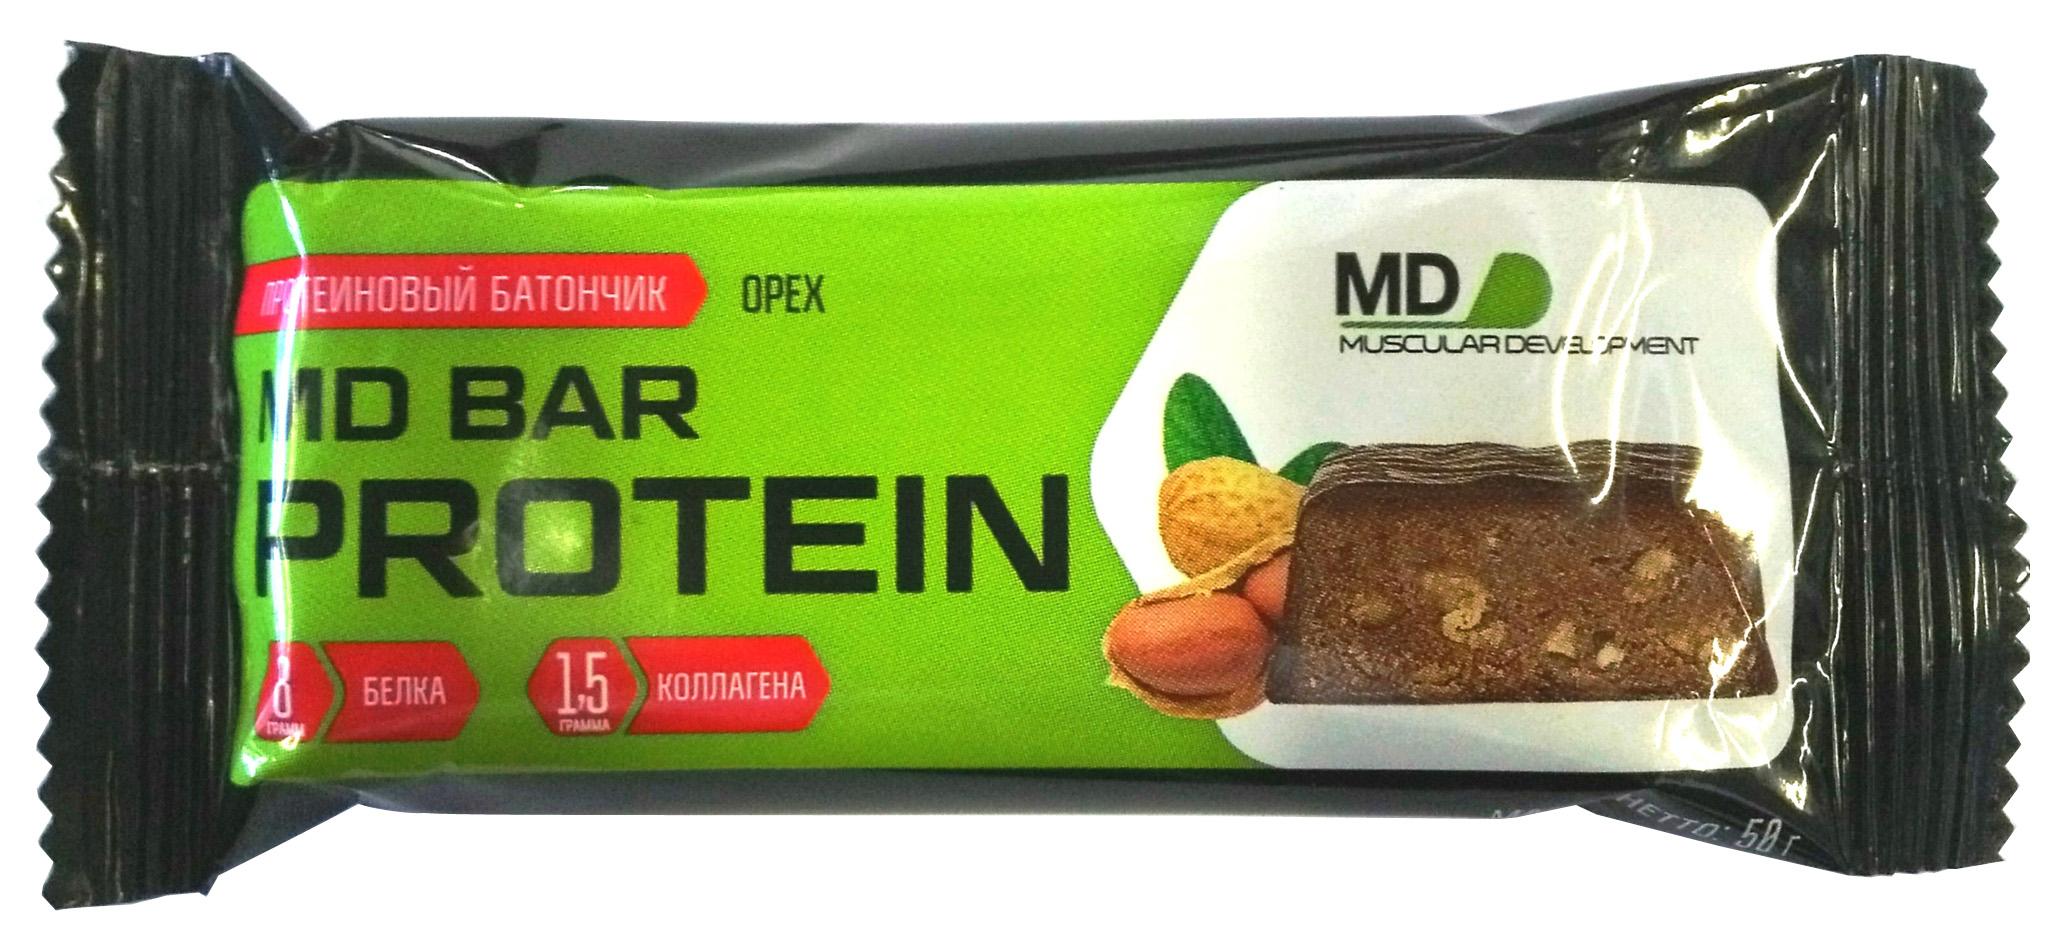 Протеиновый батончик MD Bar Protein 50 г орех